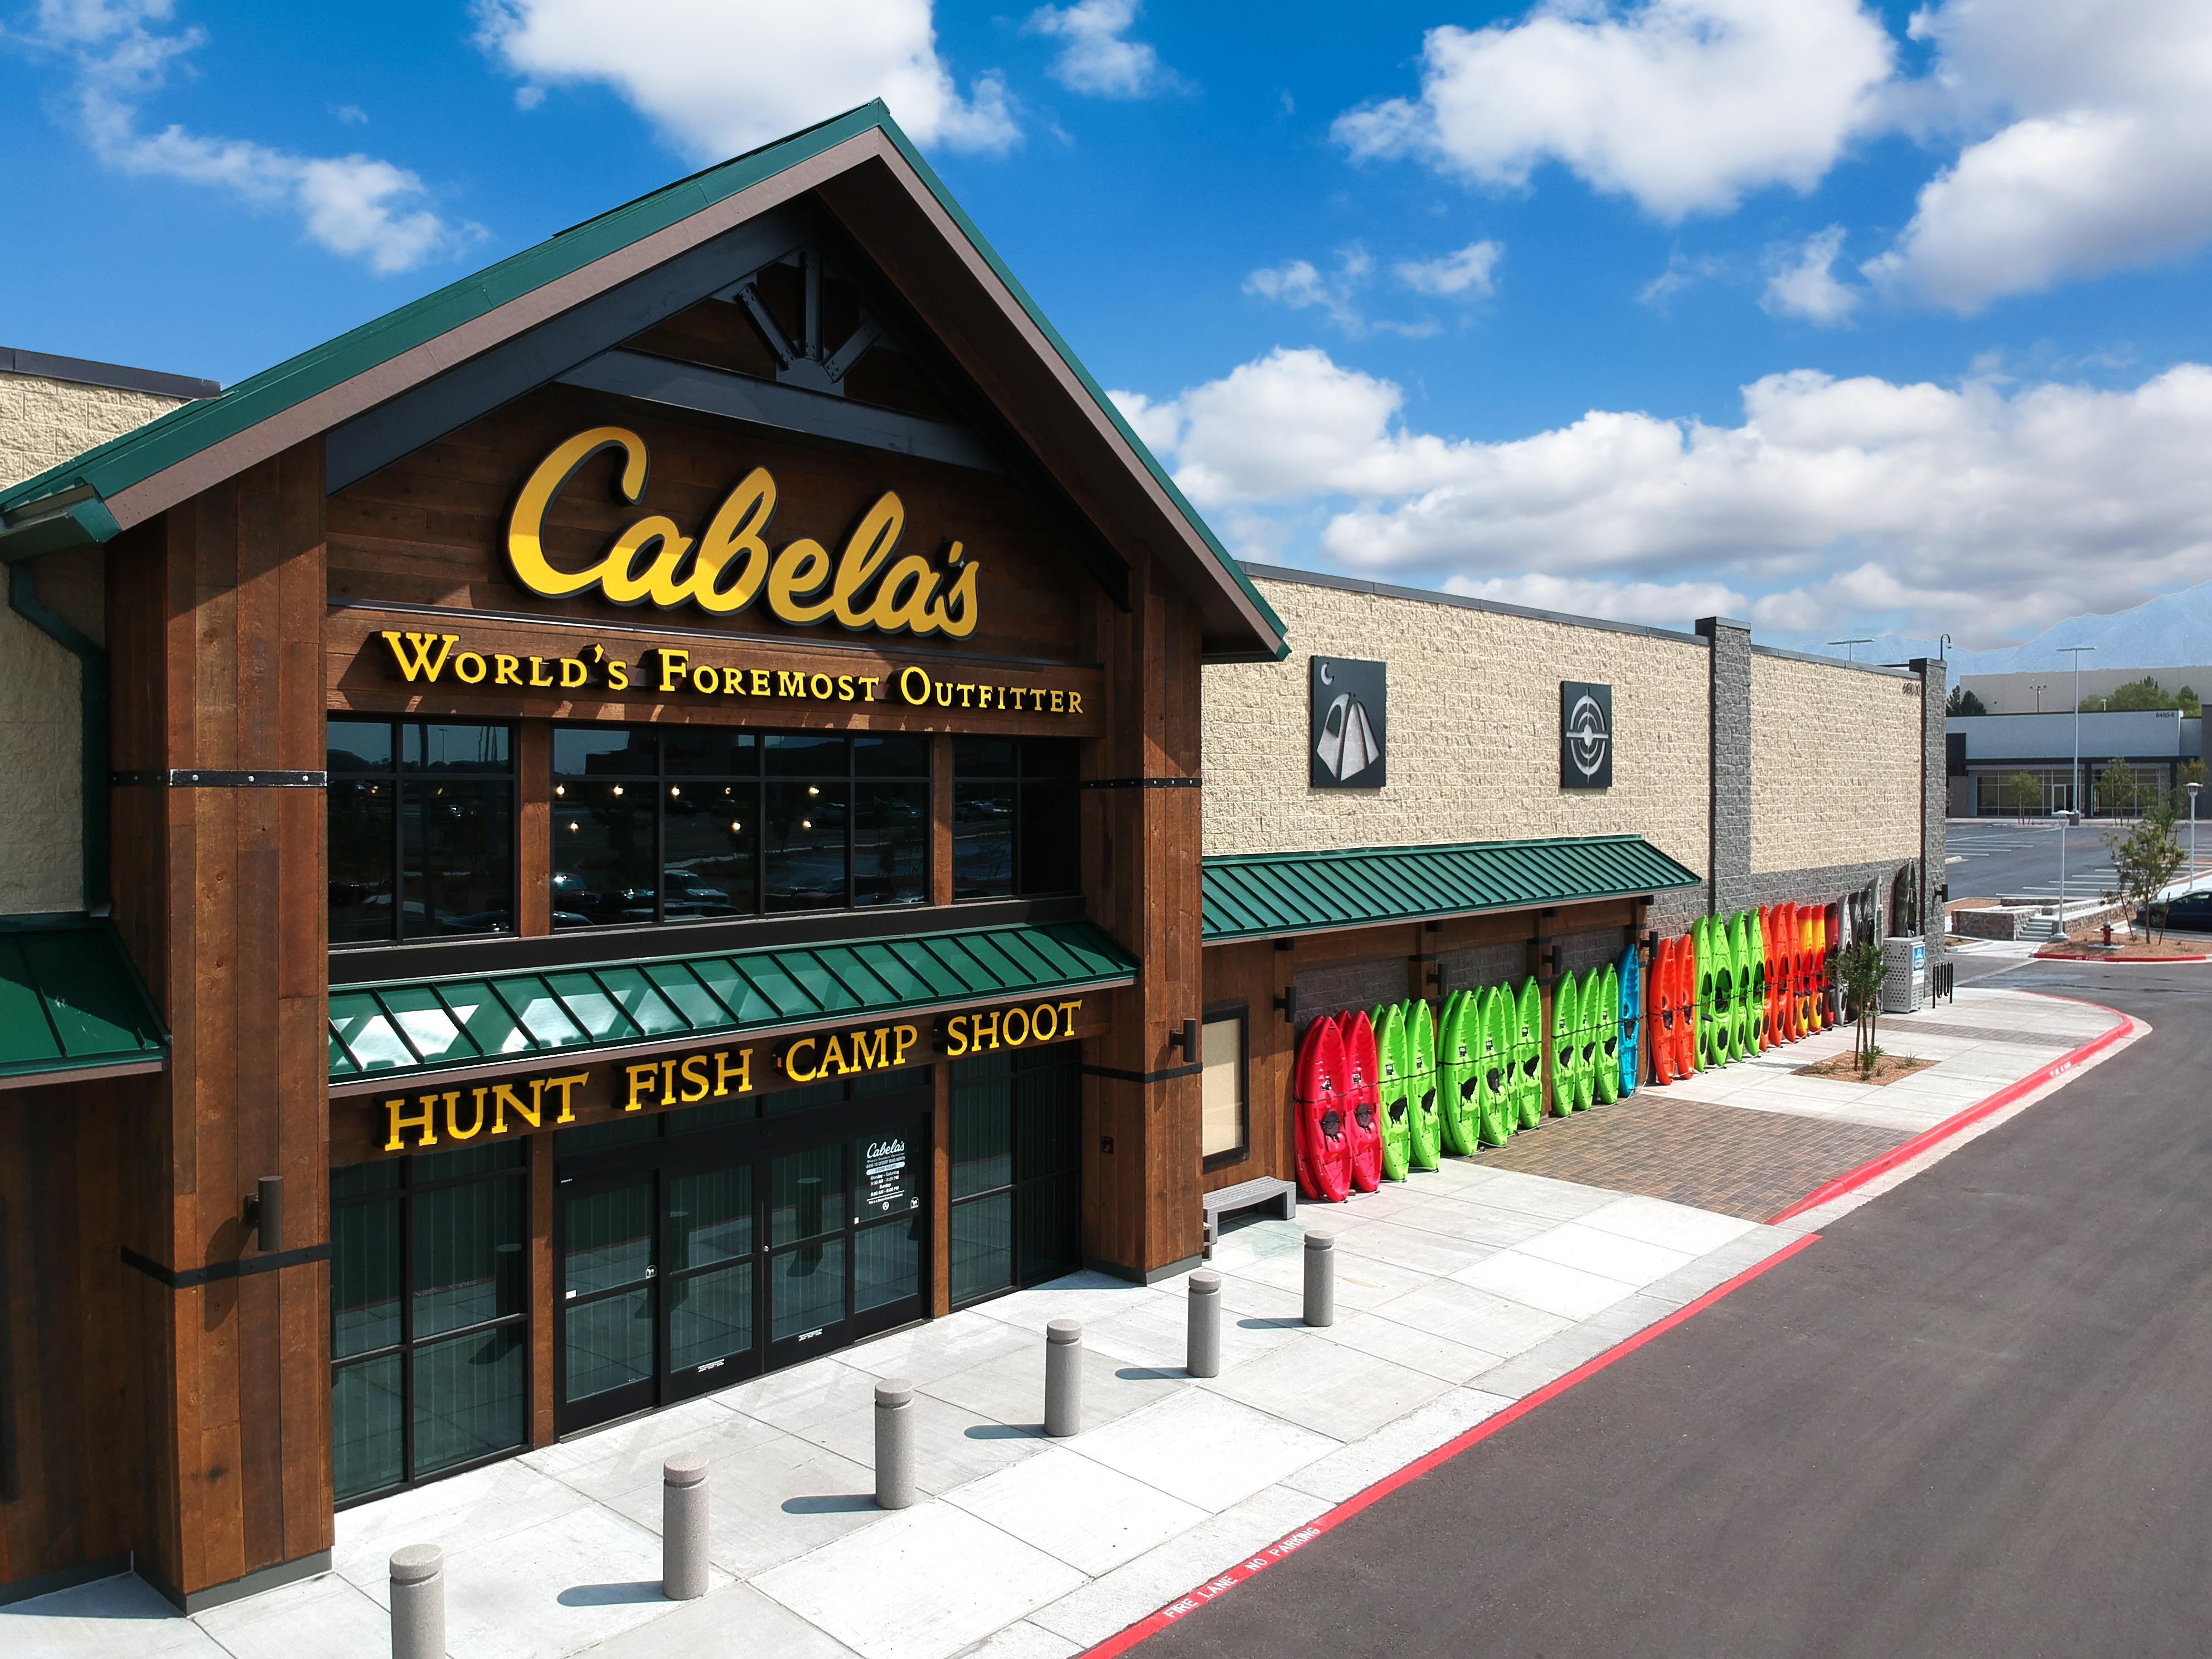 Cabelas El Paso Tx >> Cabela S Set To Open In New 100 Million West El Paso Center